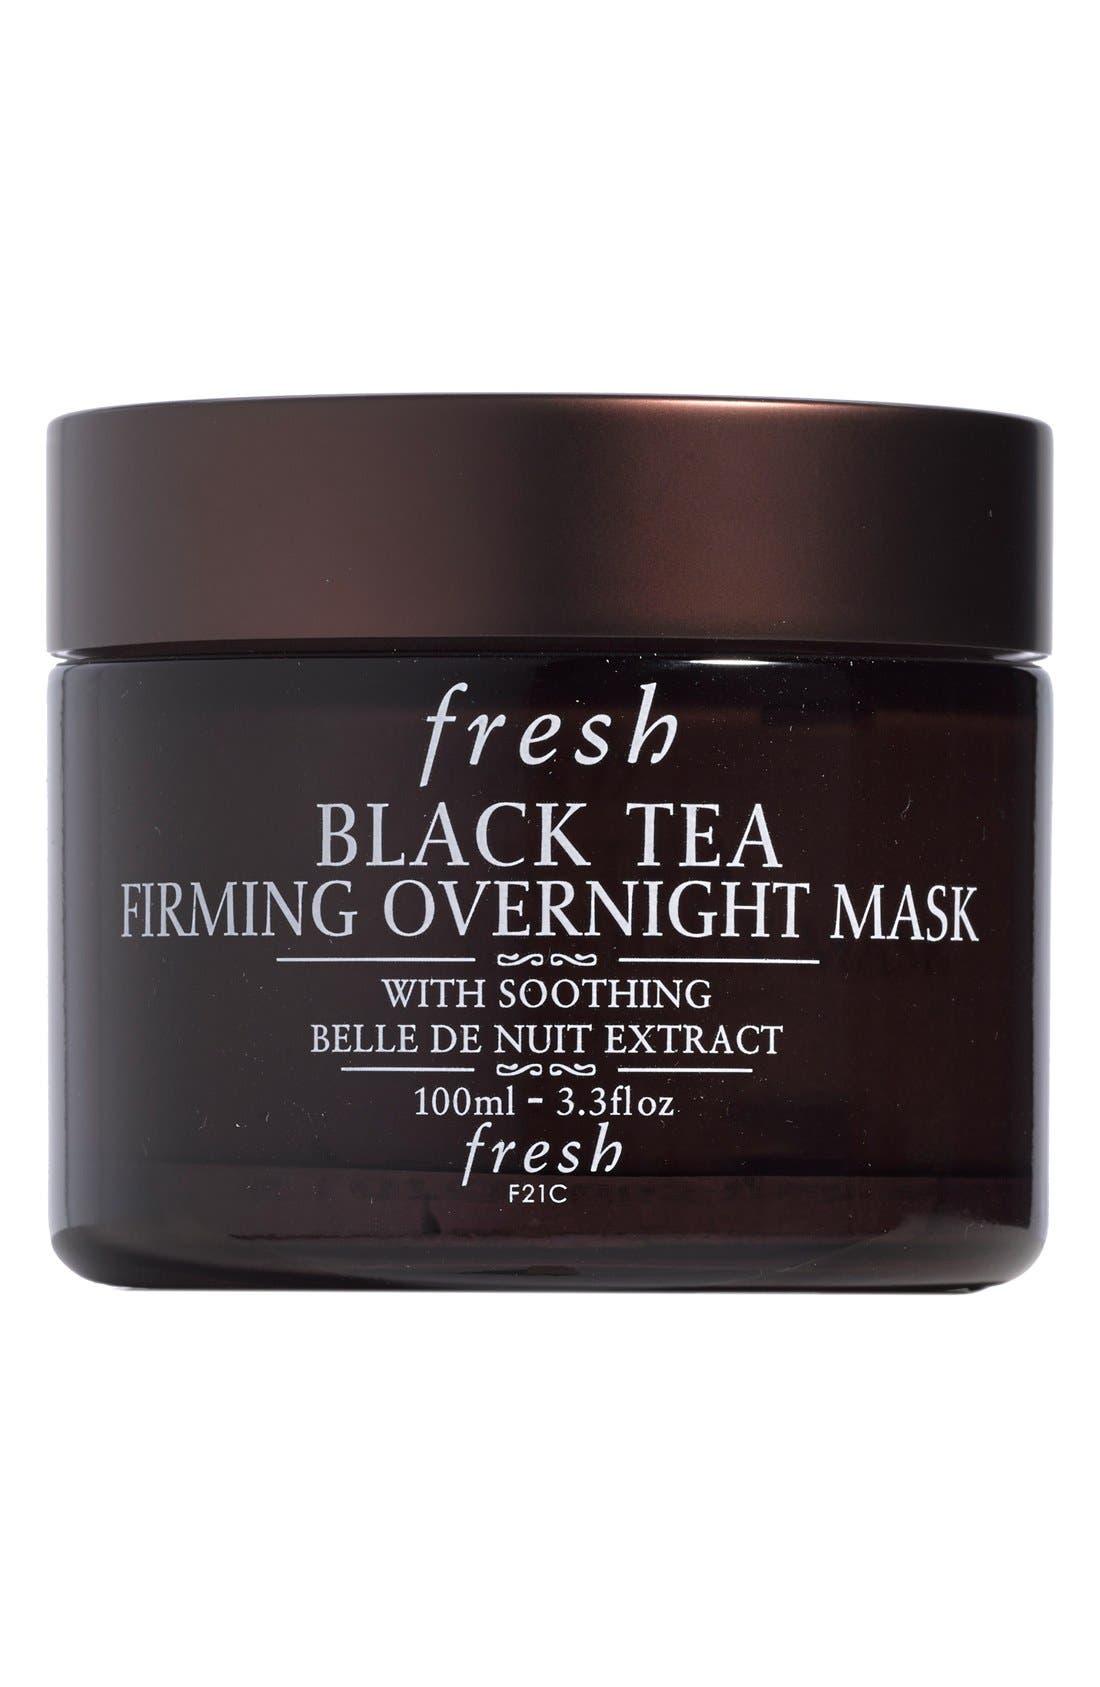 Black Tea Firming Overnight Mask,                             Alternate thumbnail 3, color,                             NO COLOR